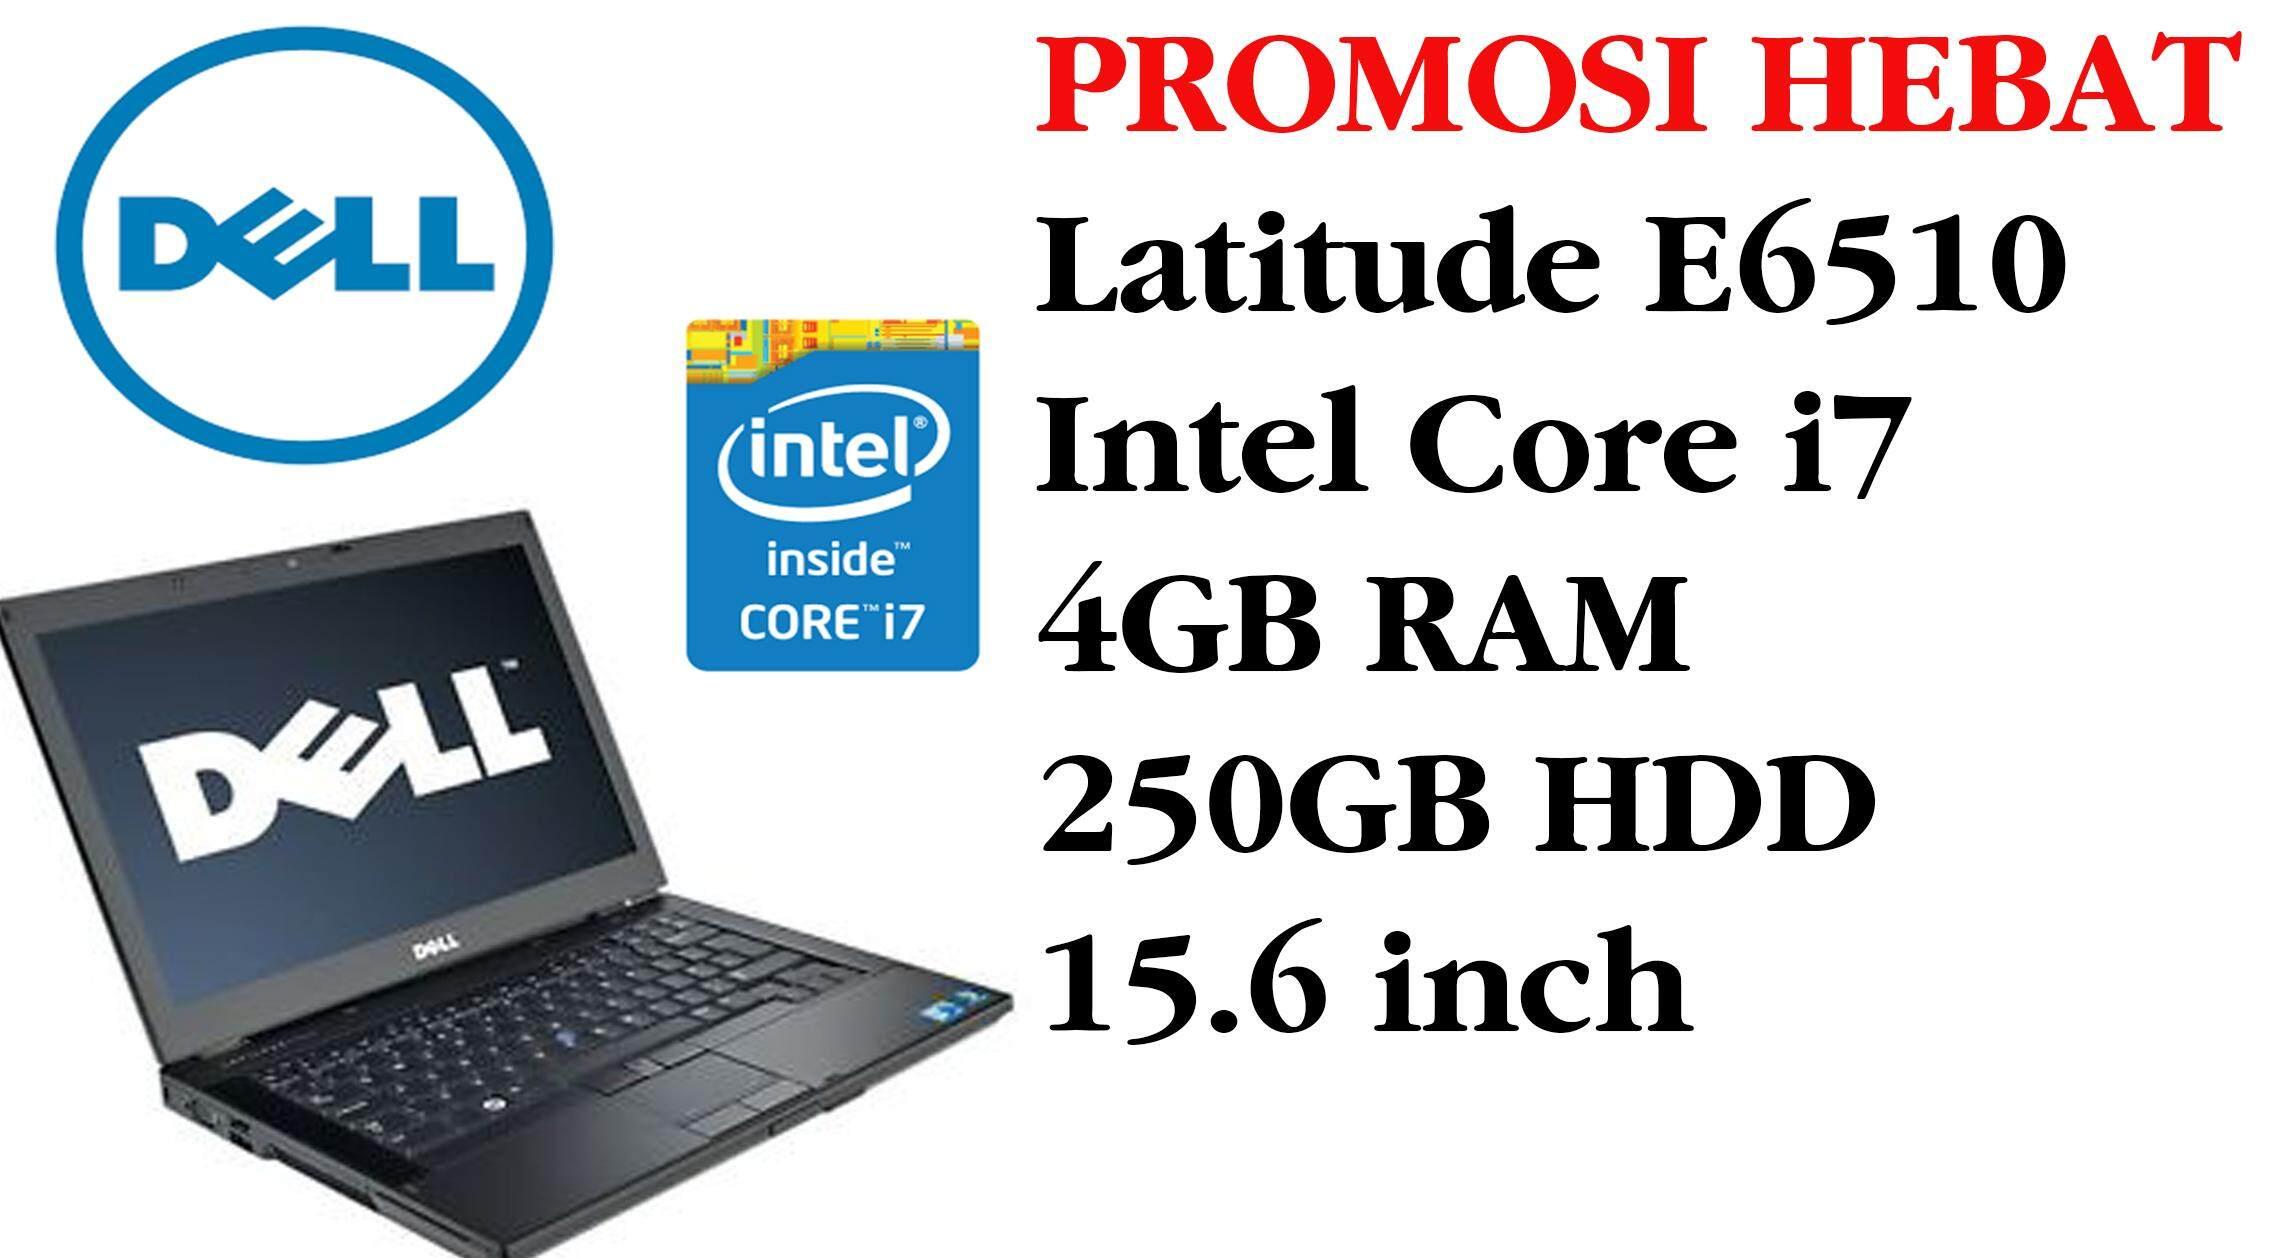 STUDENTS OFFER DELL E6510 intel core i7 4GB RAM 250 GB HDD 15.6 INCH Malaysia